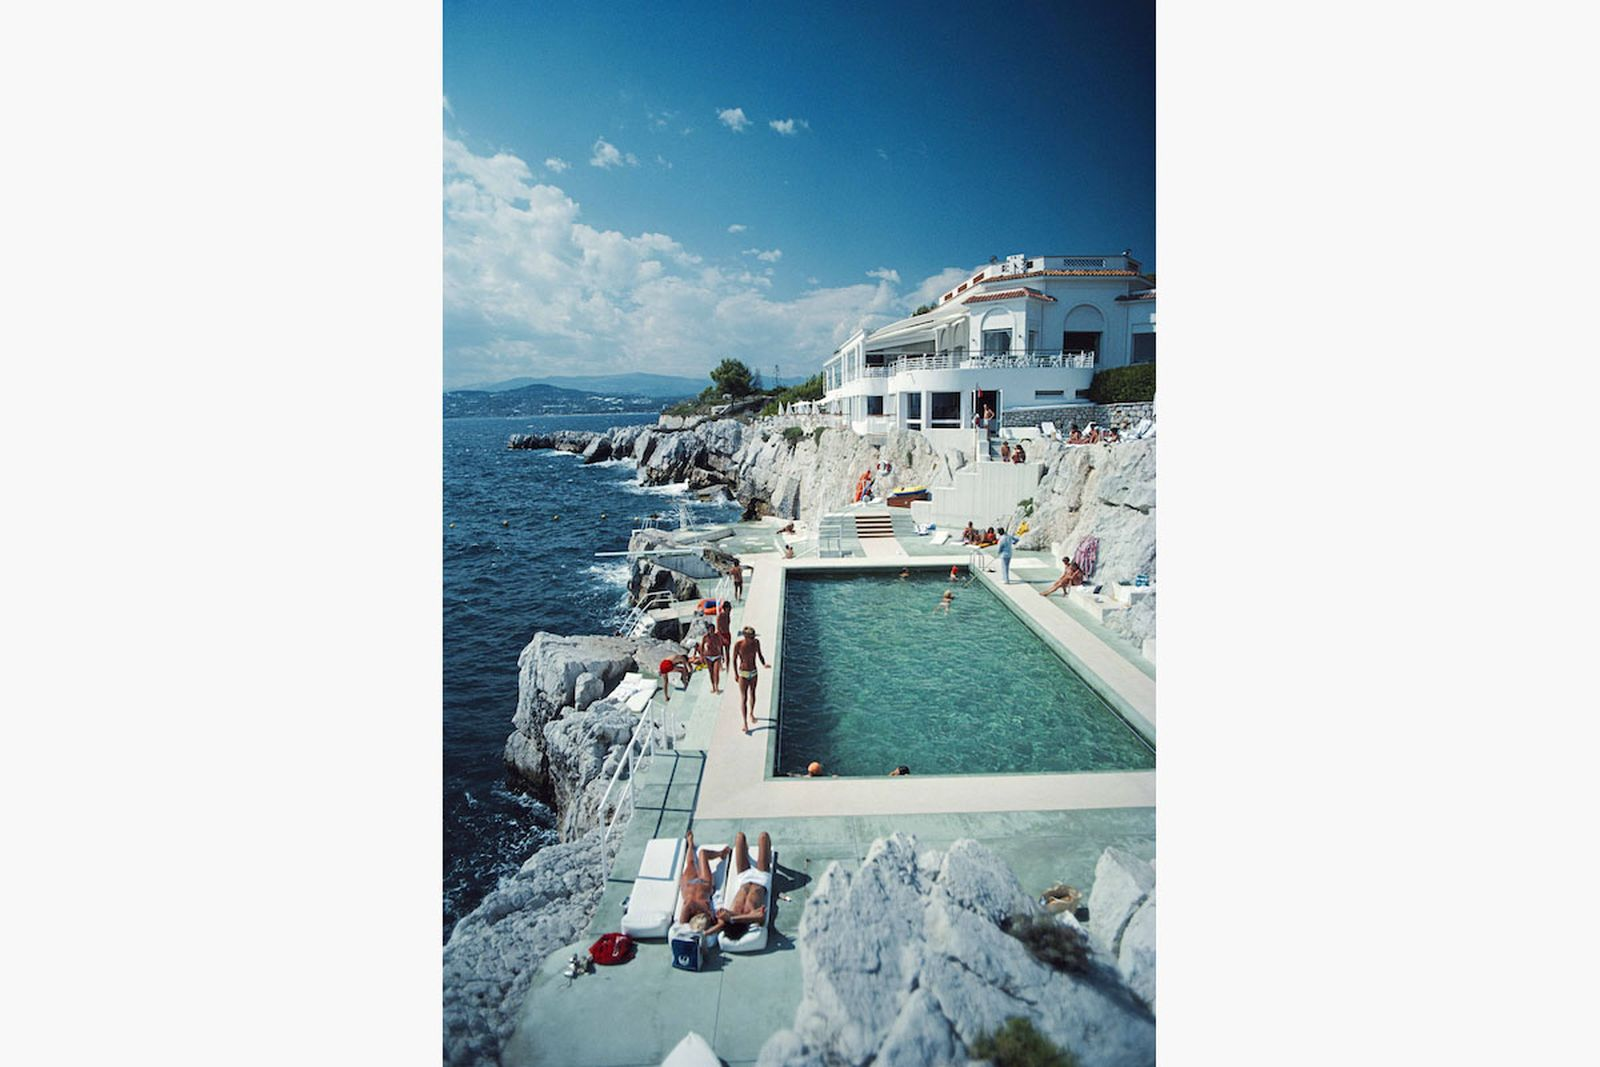 louis vuitton travel photography books